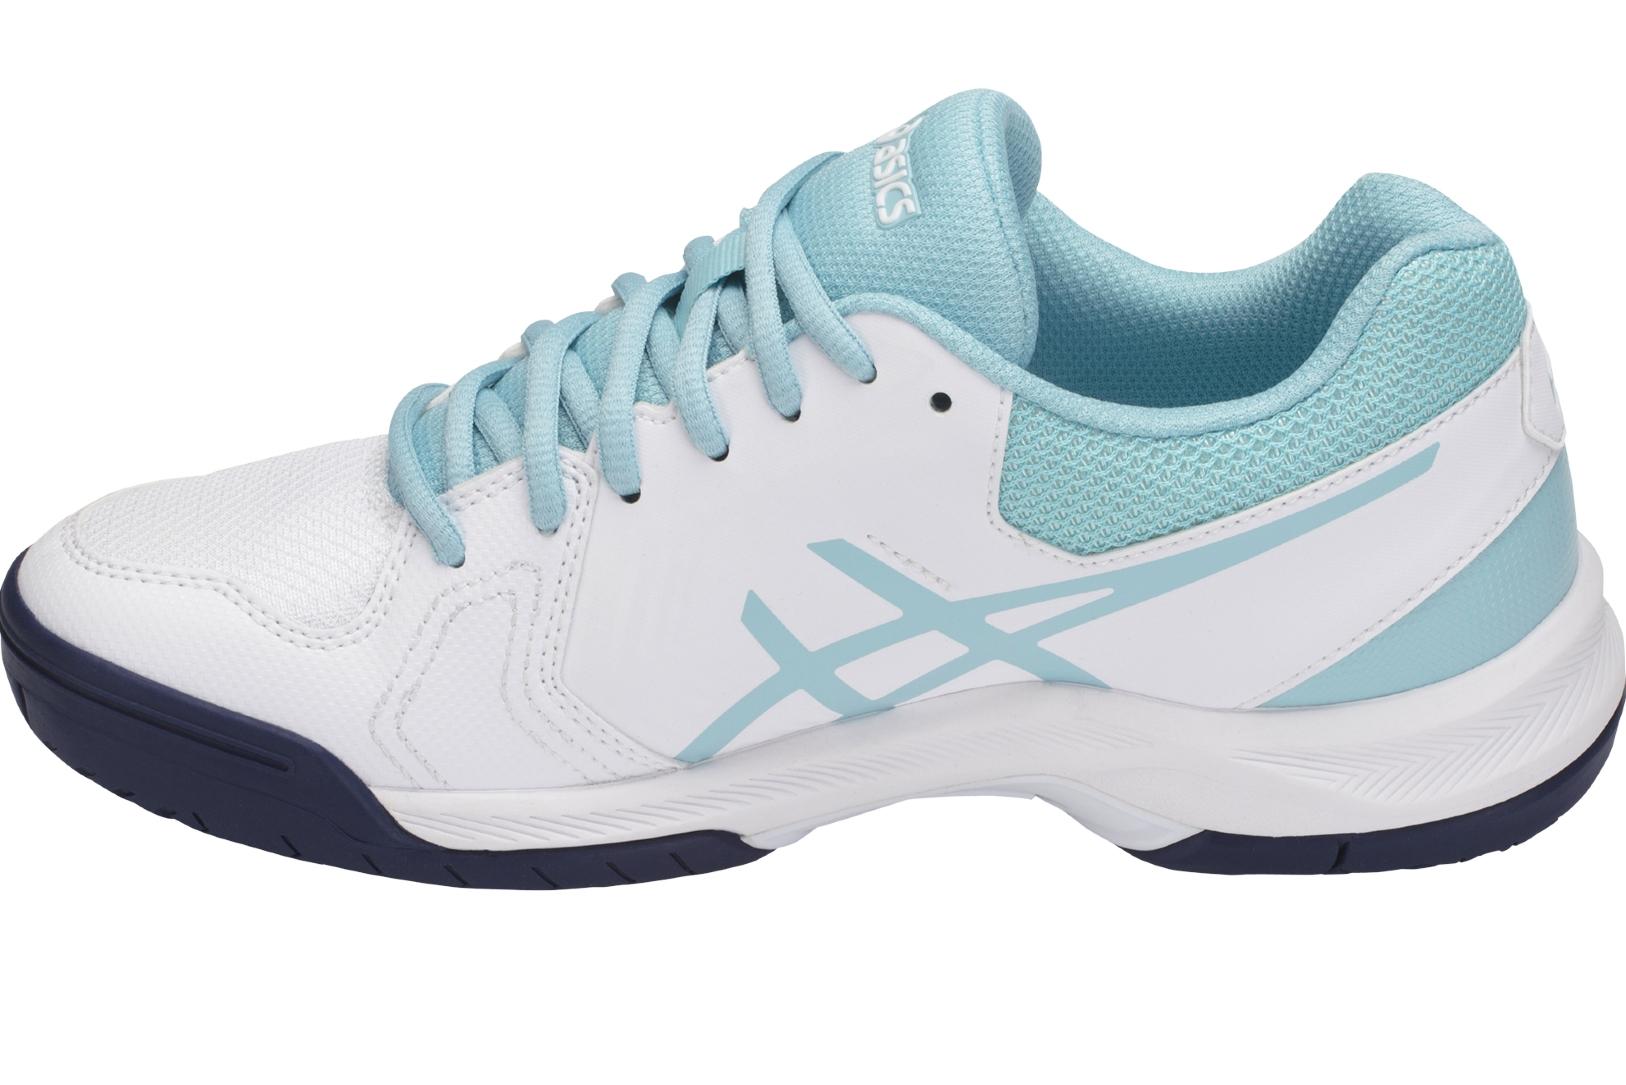 Asics Gel-Dedicate 5 E757Y-0114 Femme Chaussures de tennis Rose ... 3908118d4673